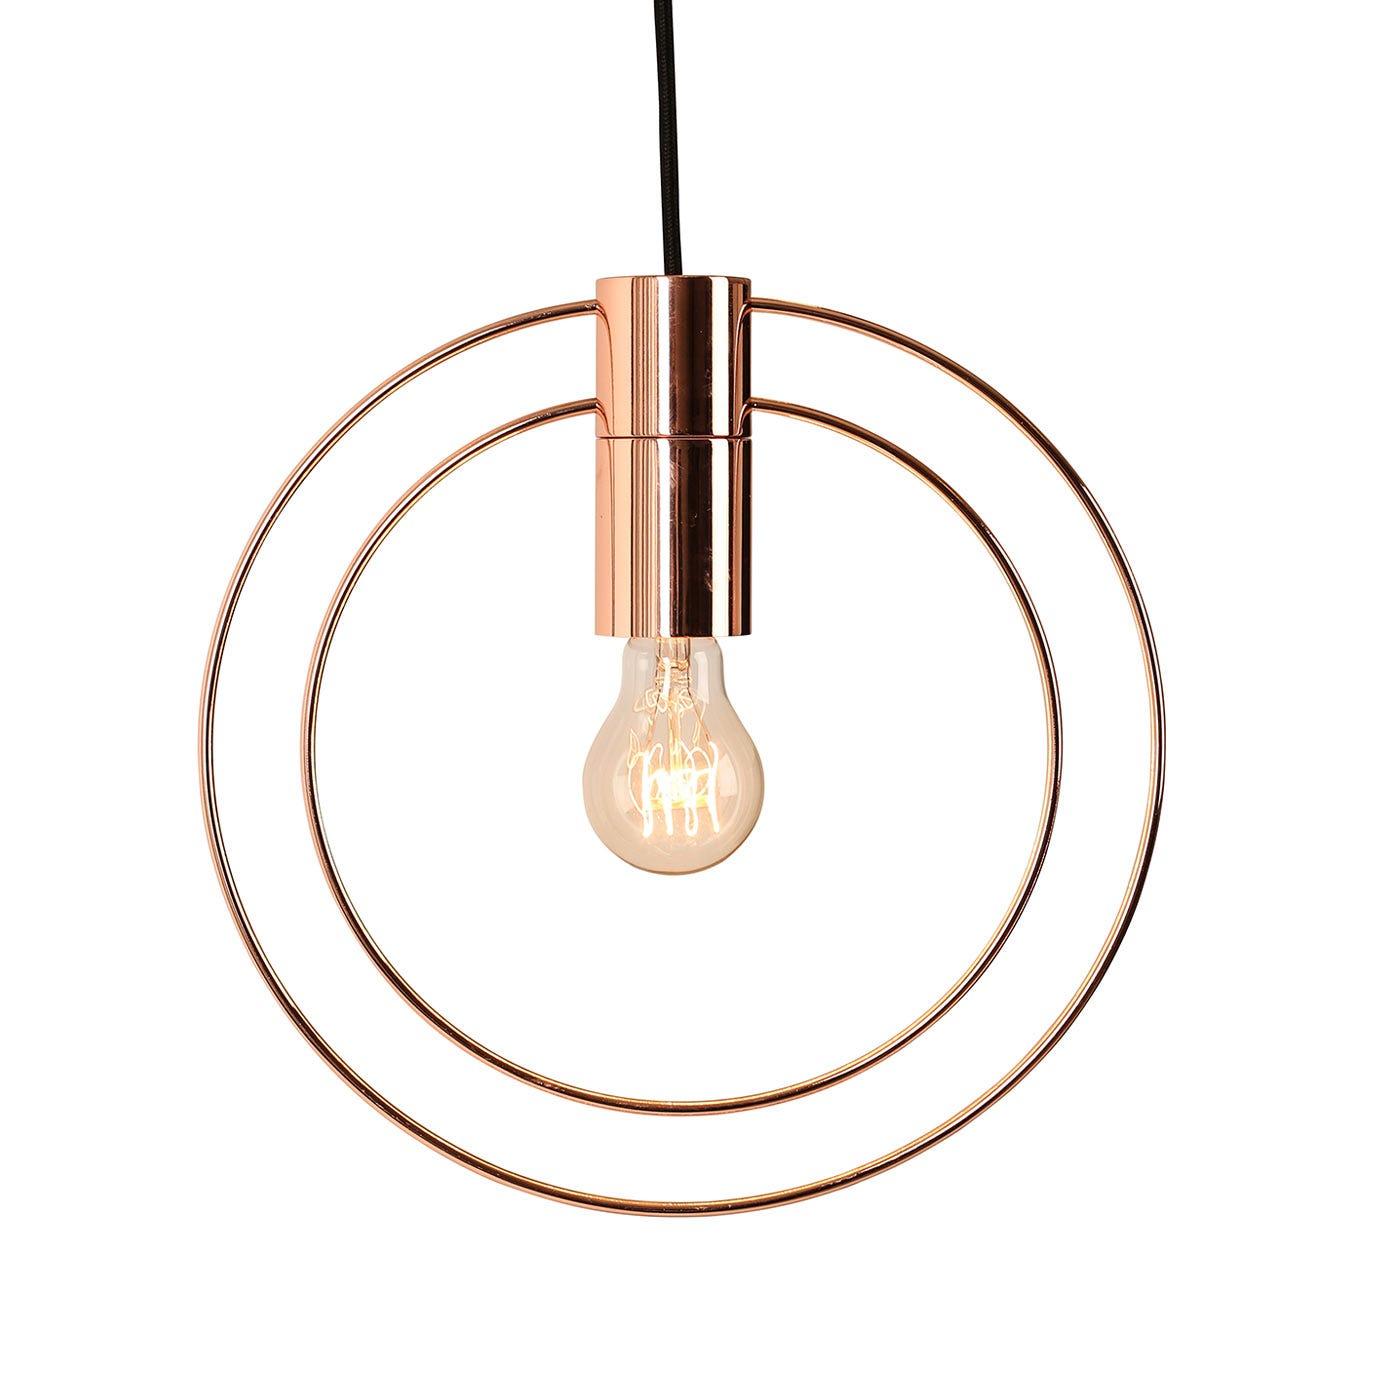 Heals halo pendant copper halo pendant light copper aloadofball Image collections